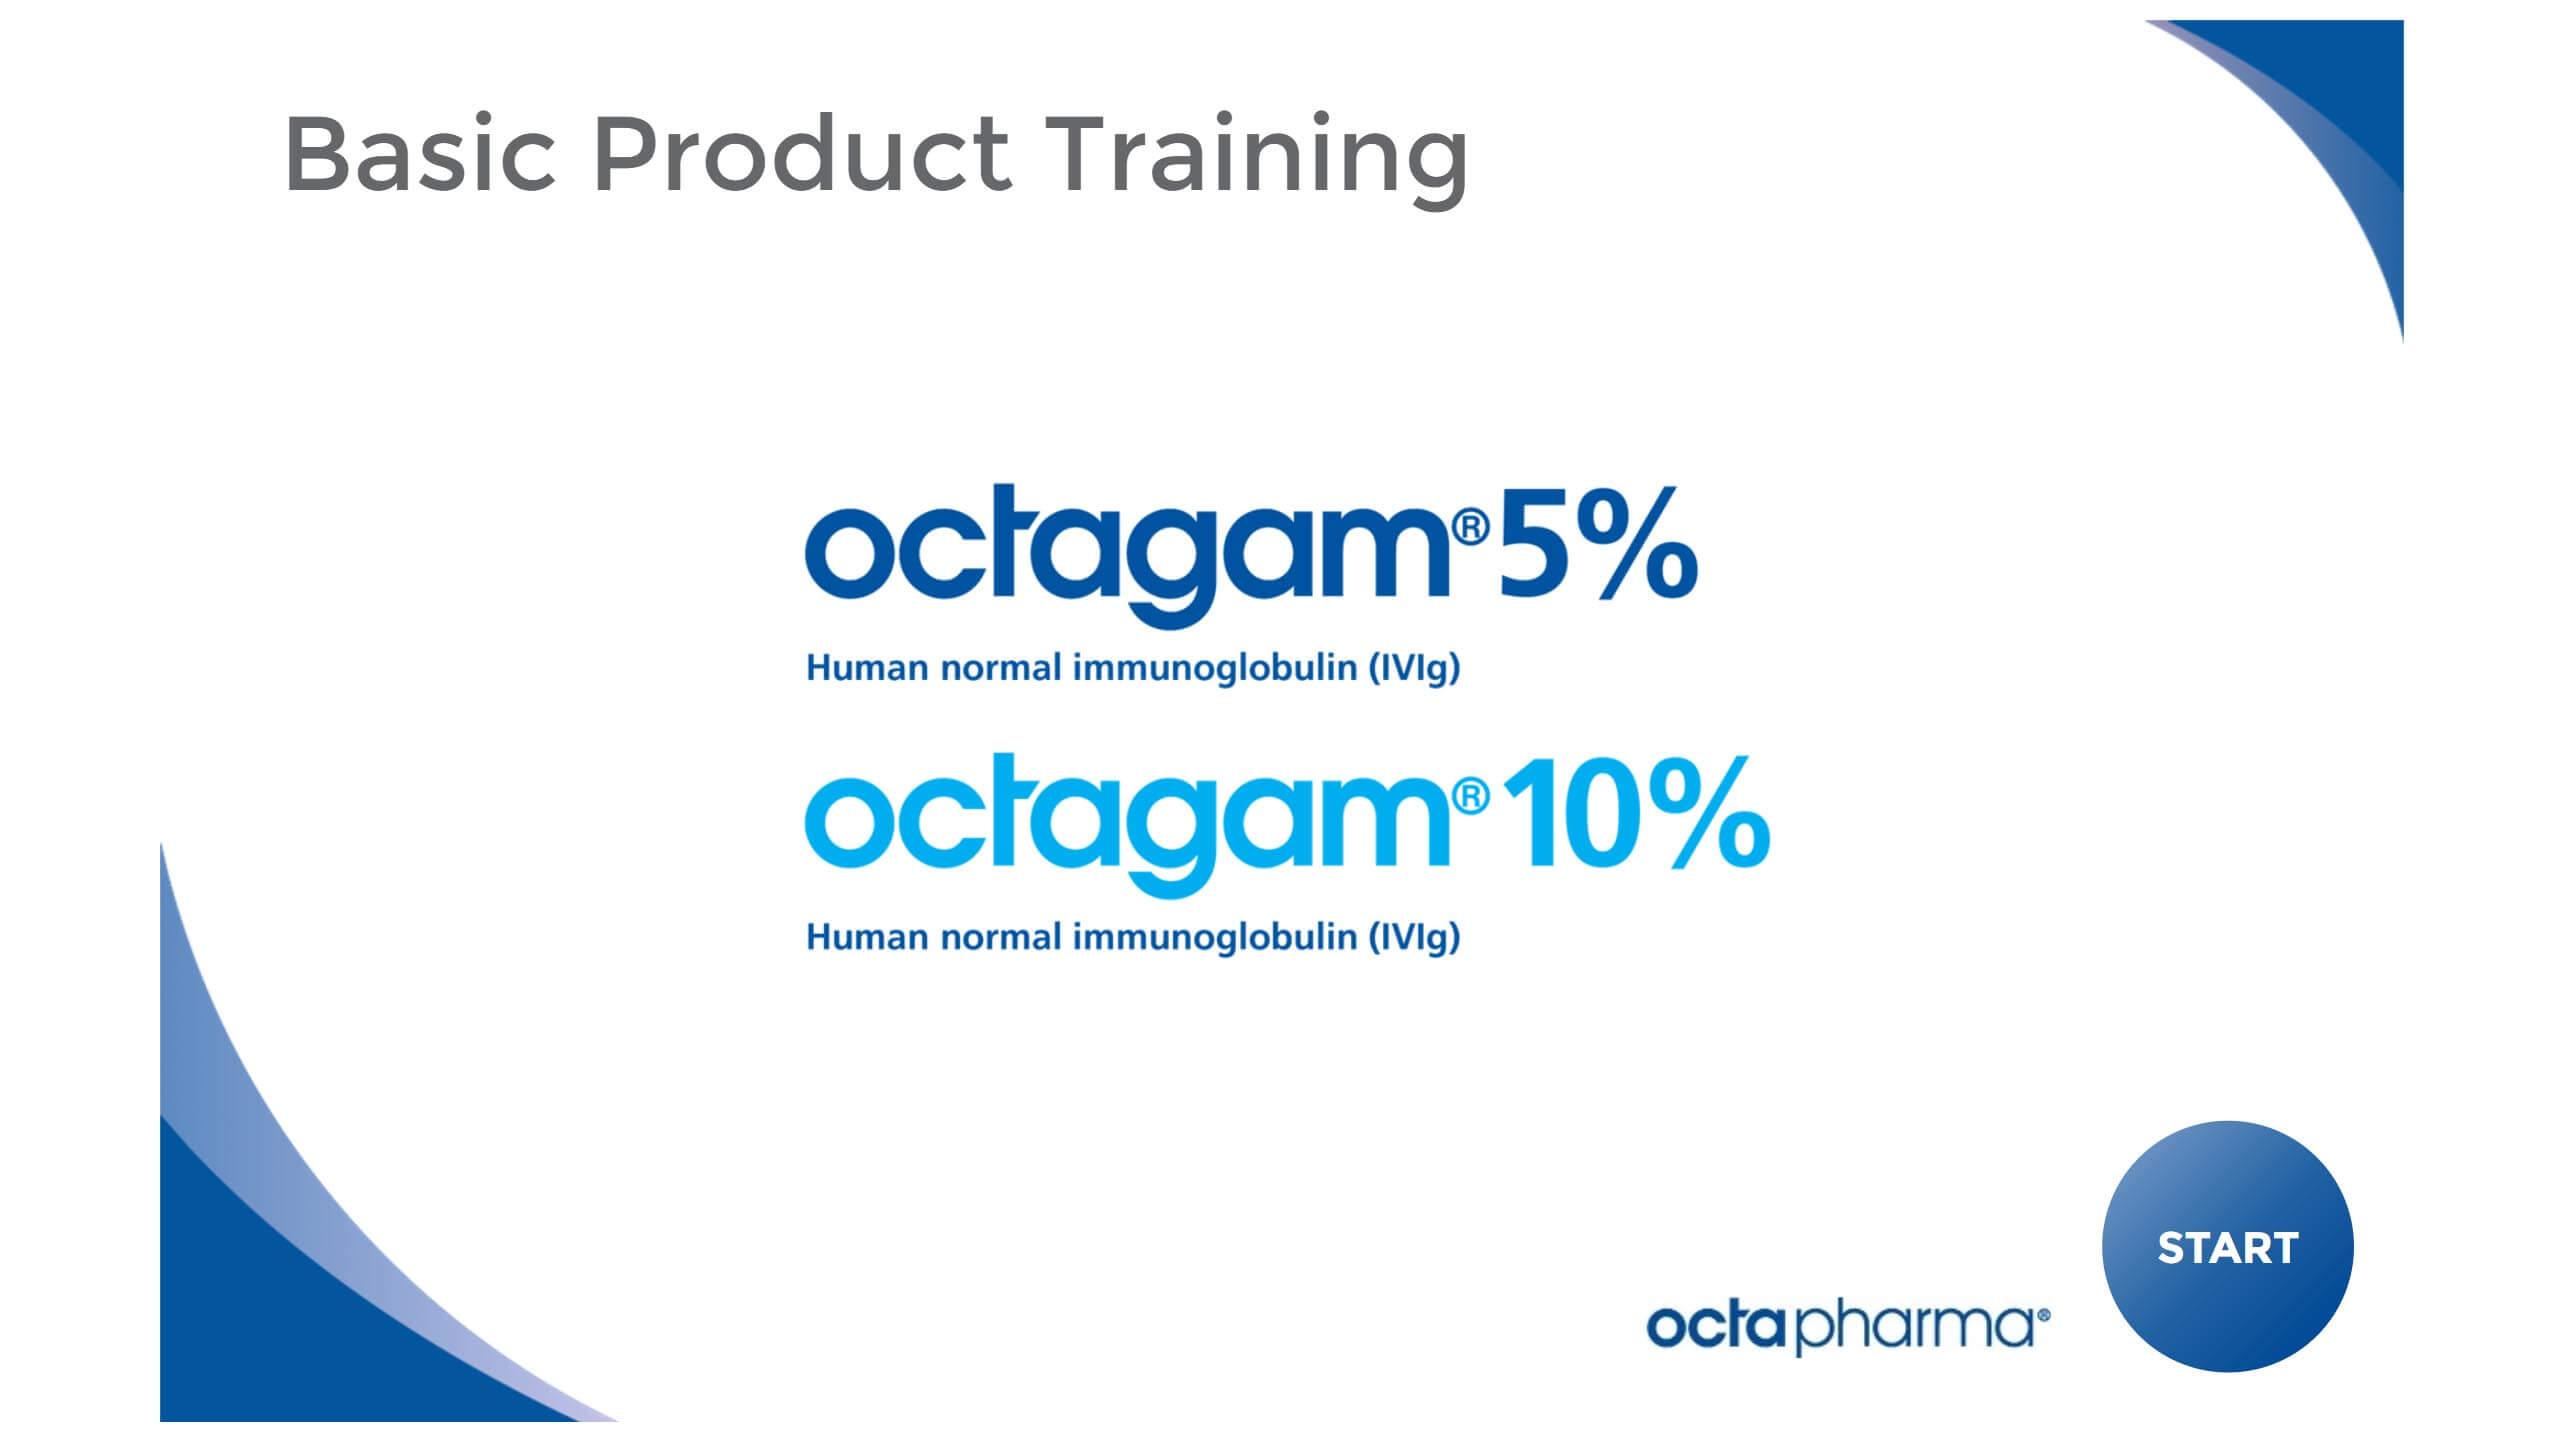 Octagamma Training